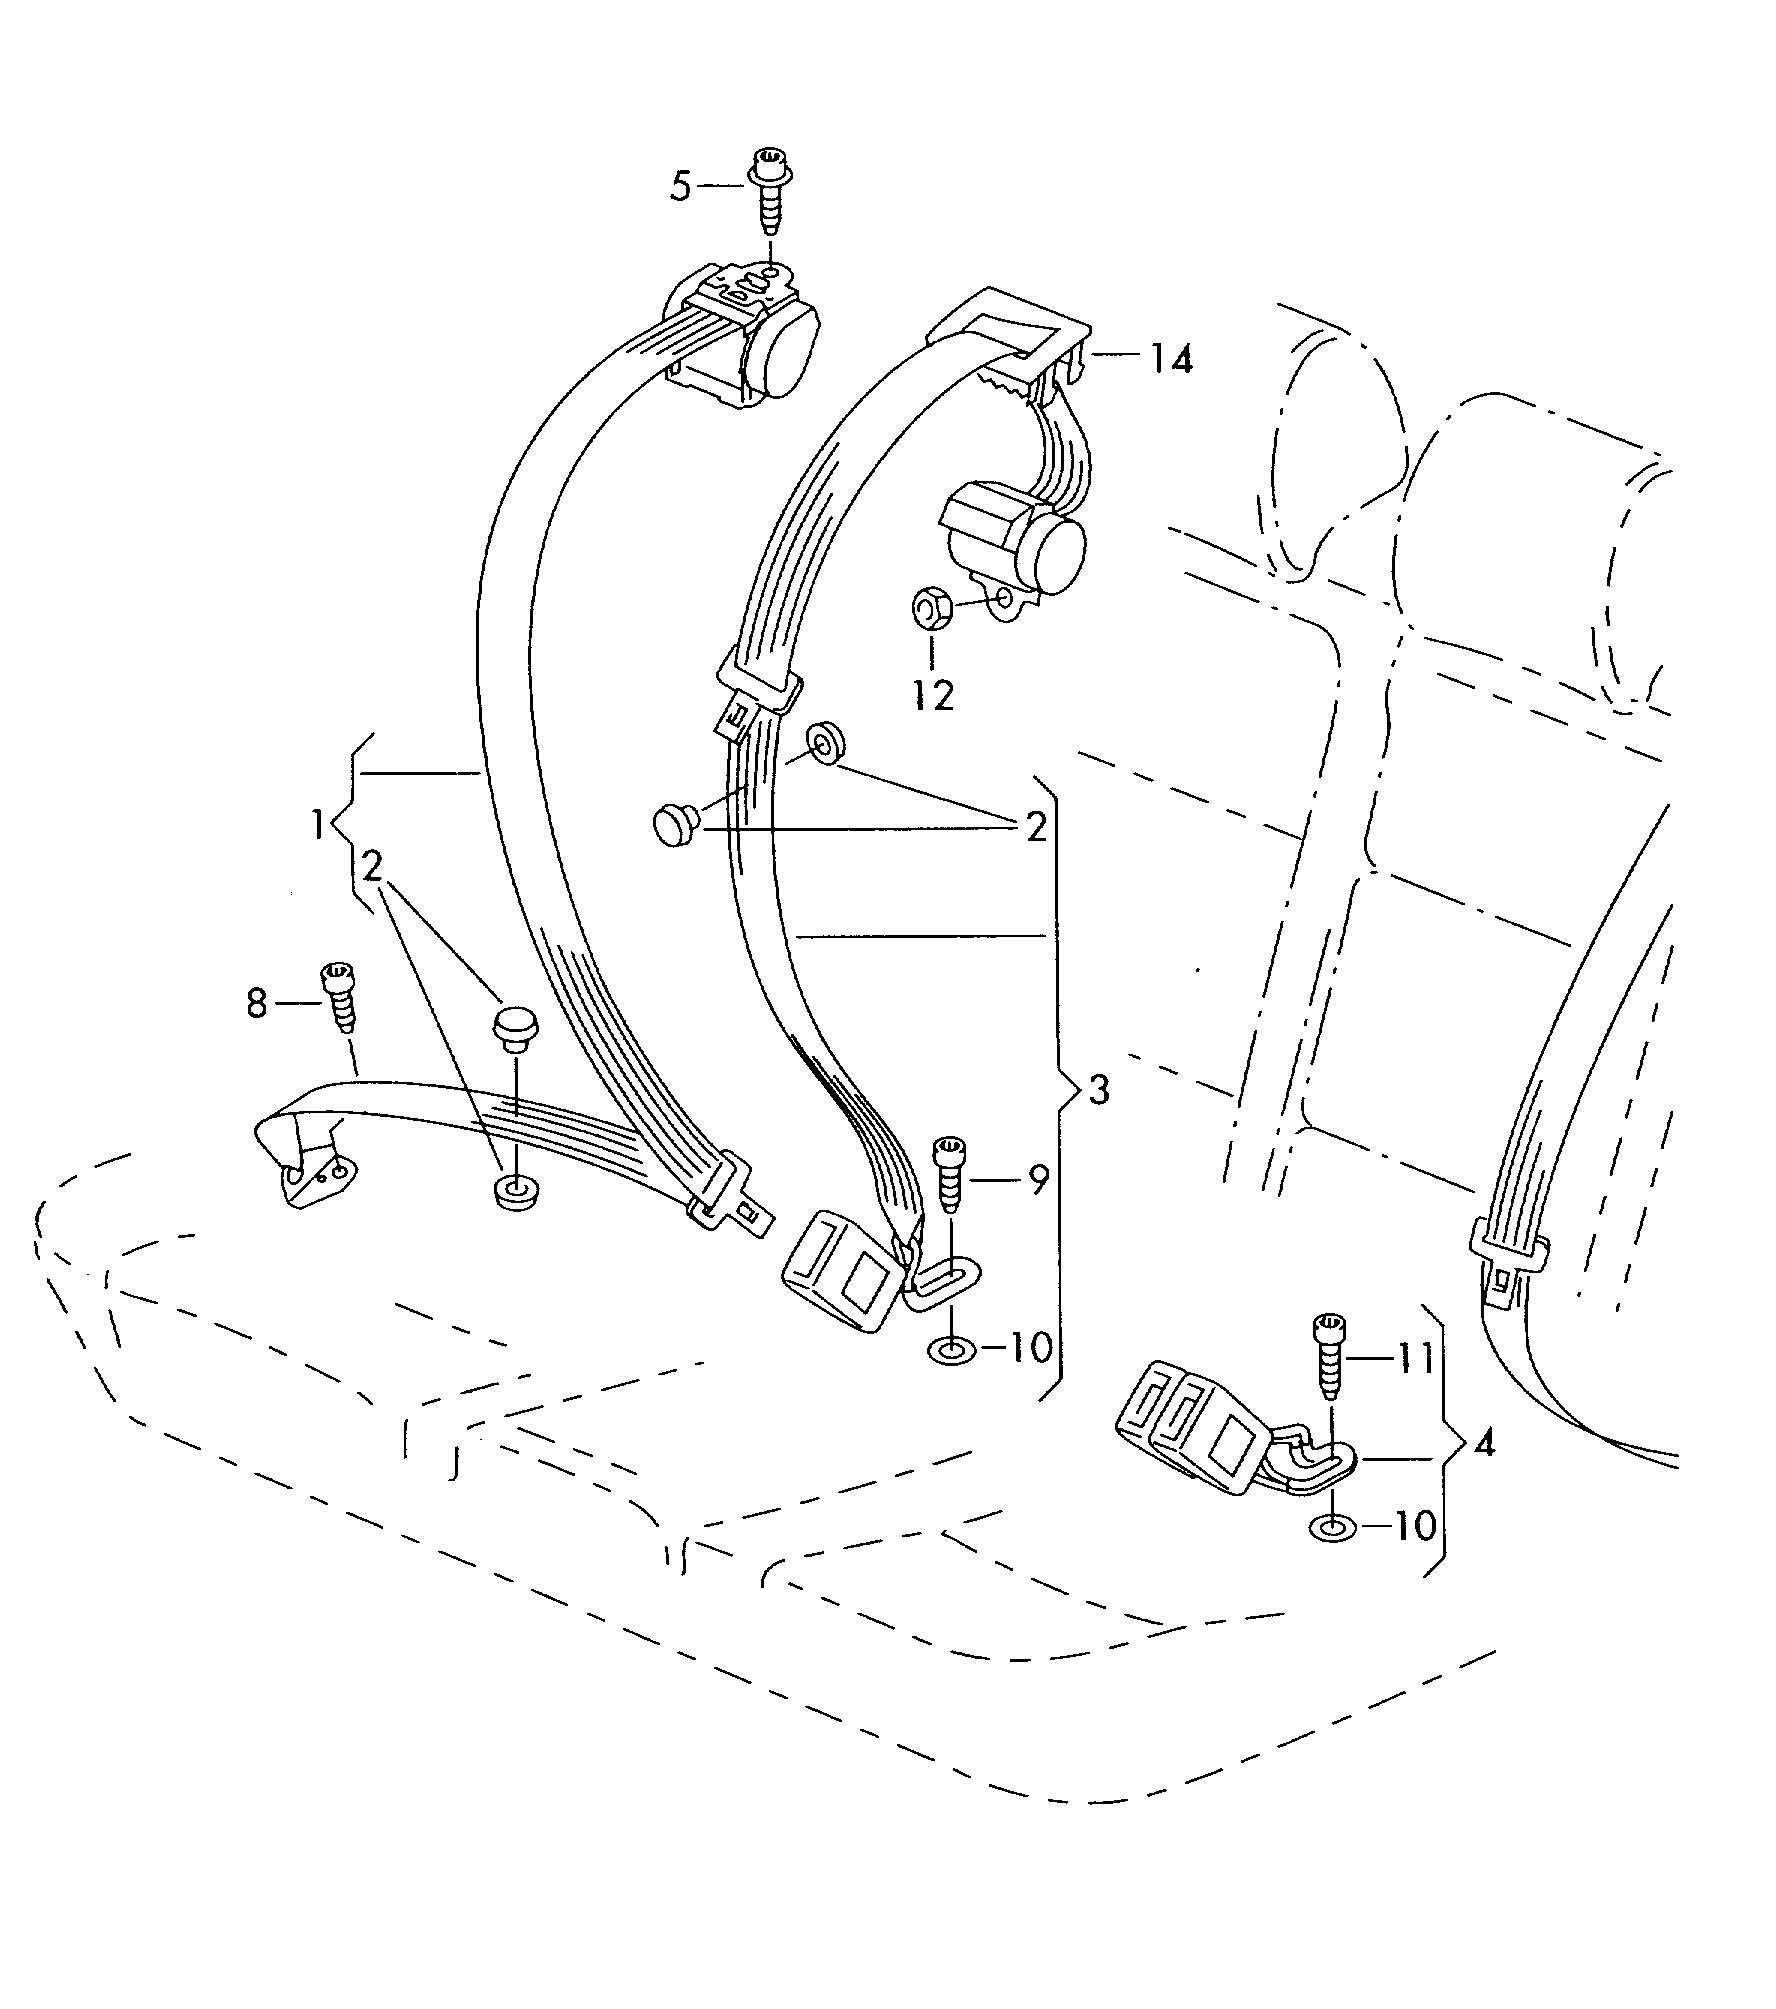 2008 hyundai tiburon fuse box diagram  hyundai  auto fuse